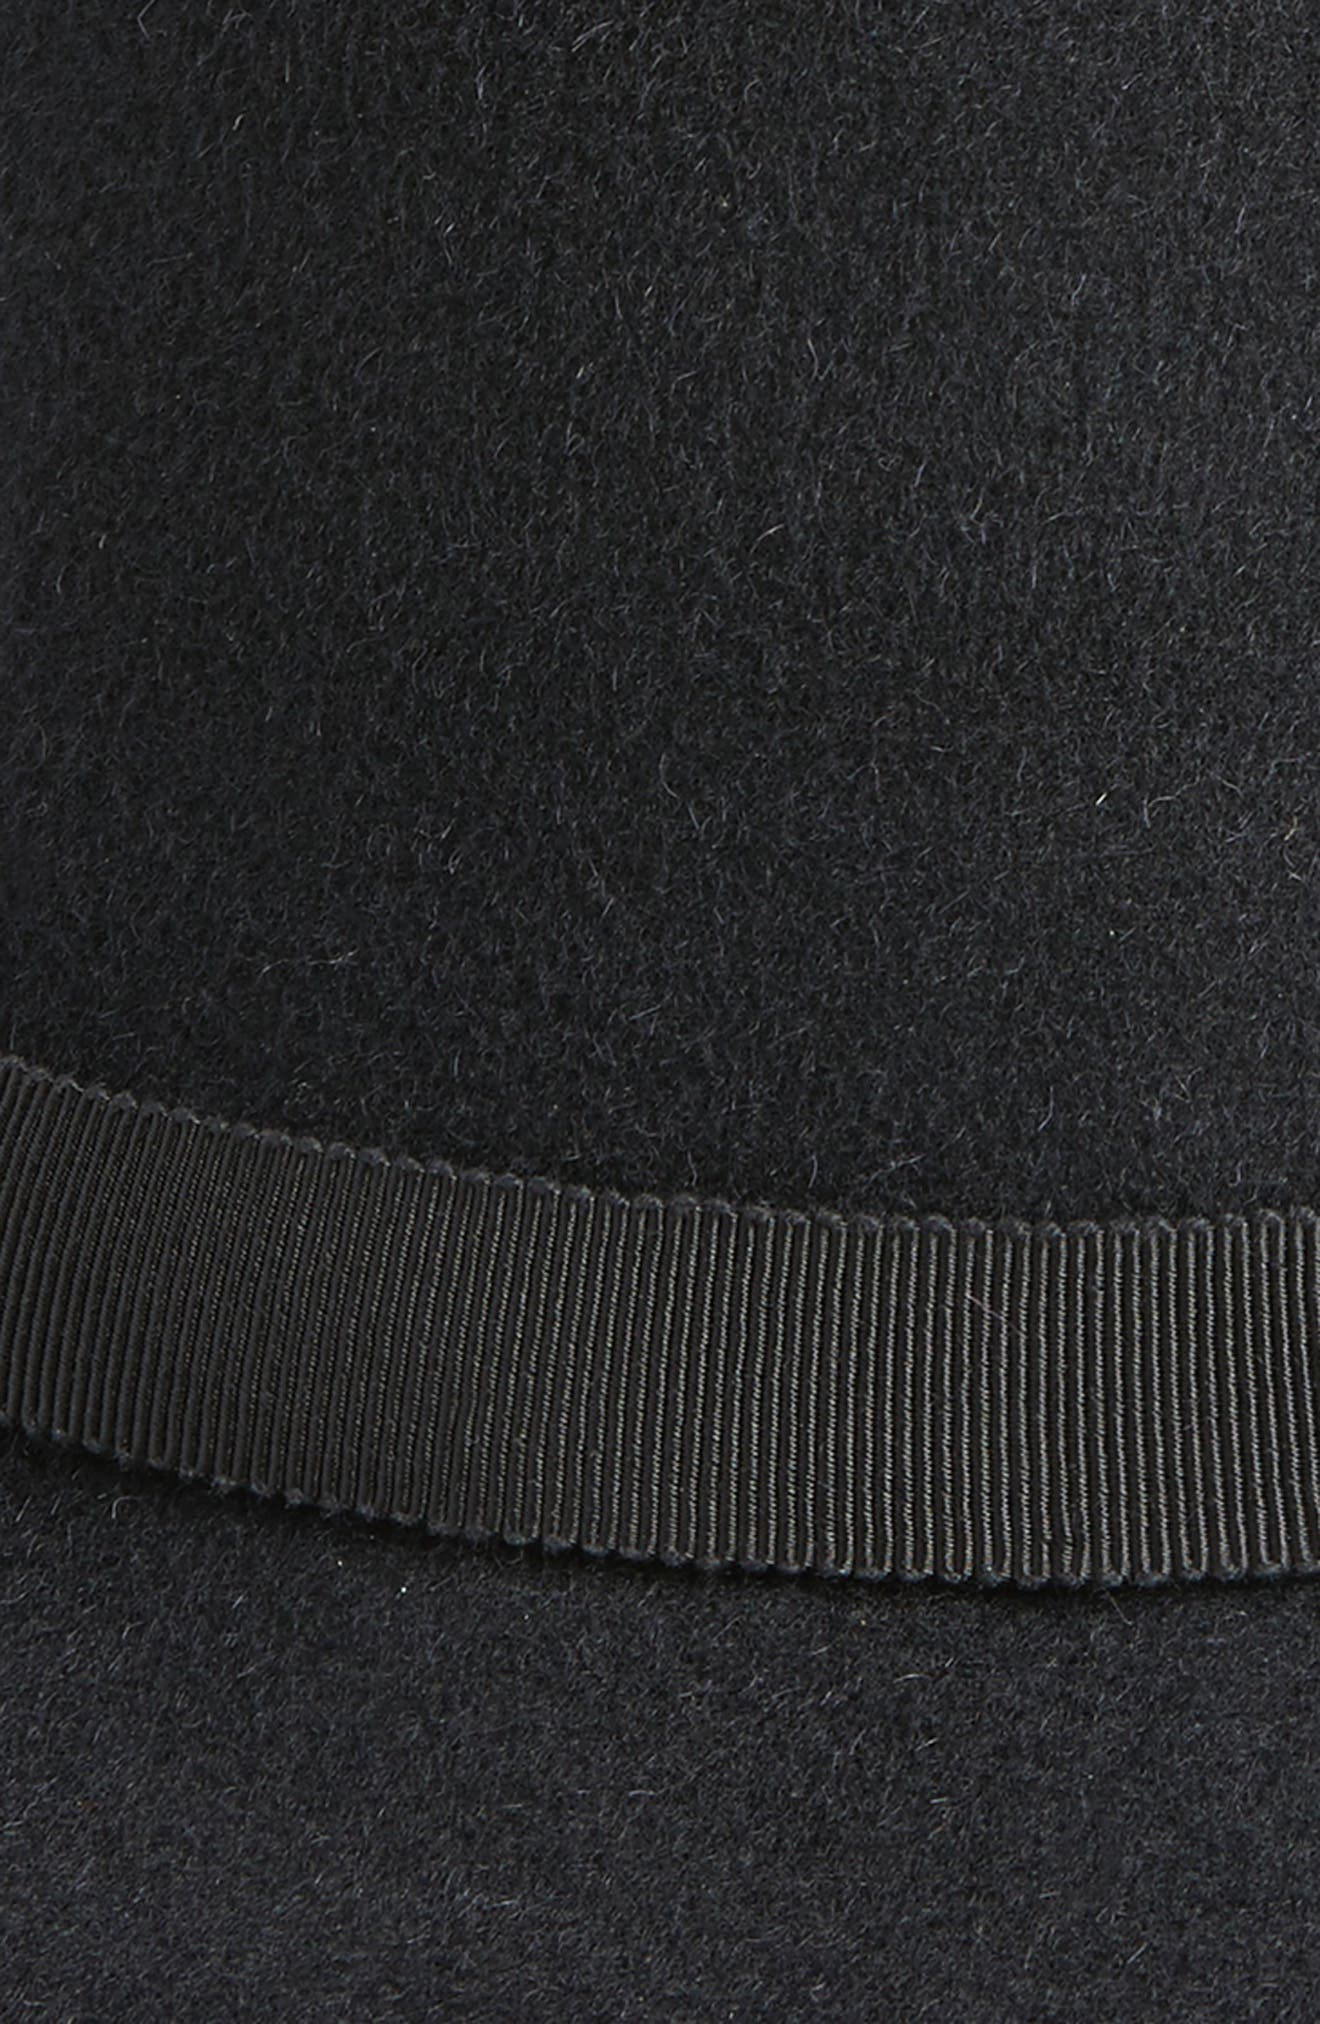 Alternate Image 2  - Helen Kaminski Luxe Tapered Cloche Hat